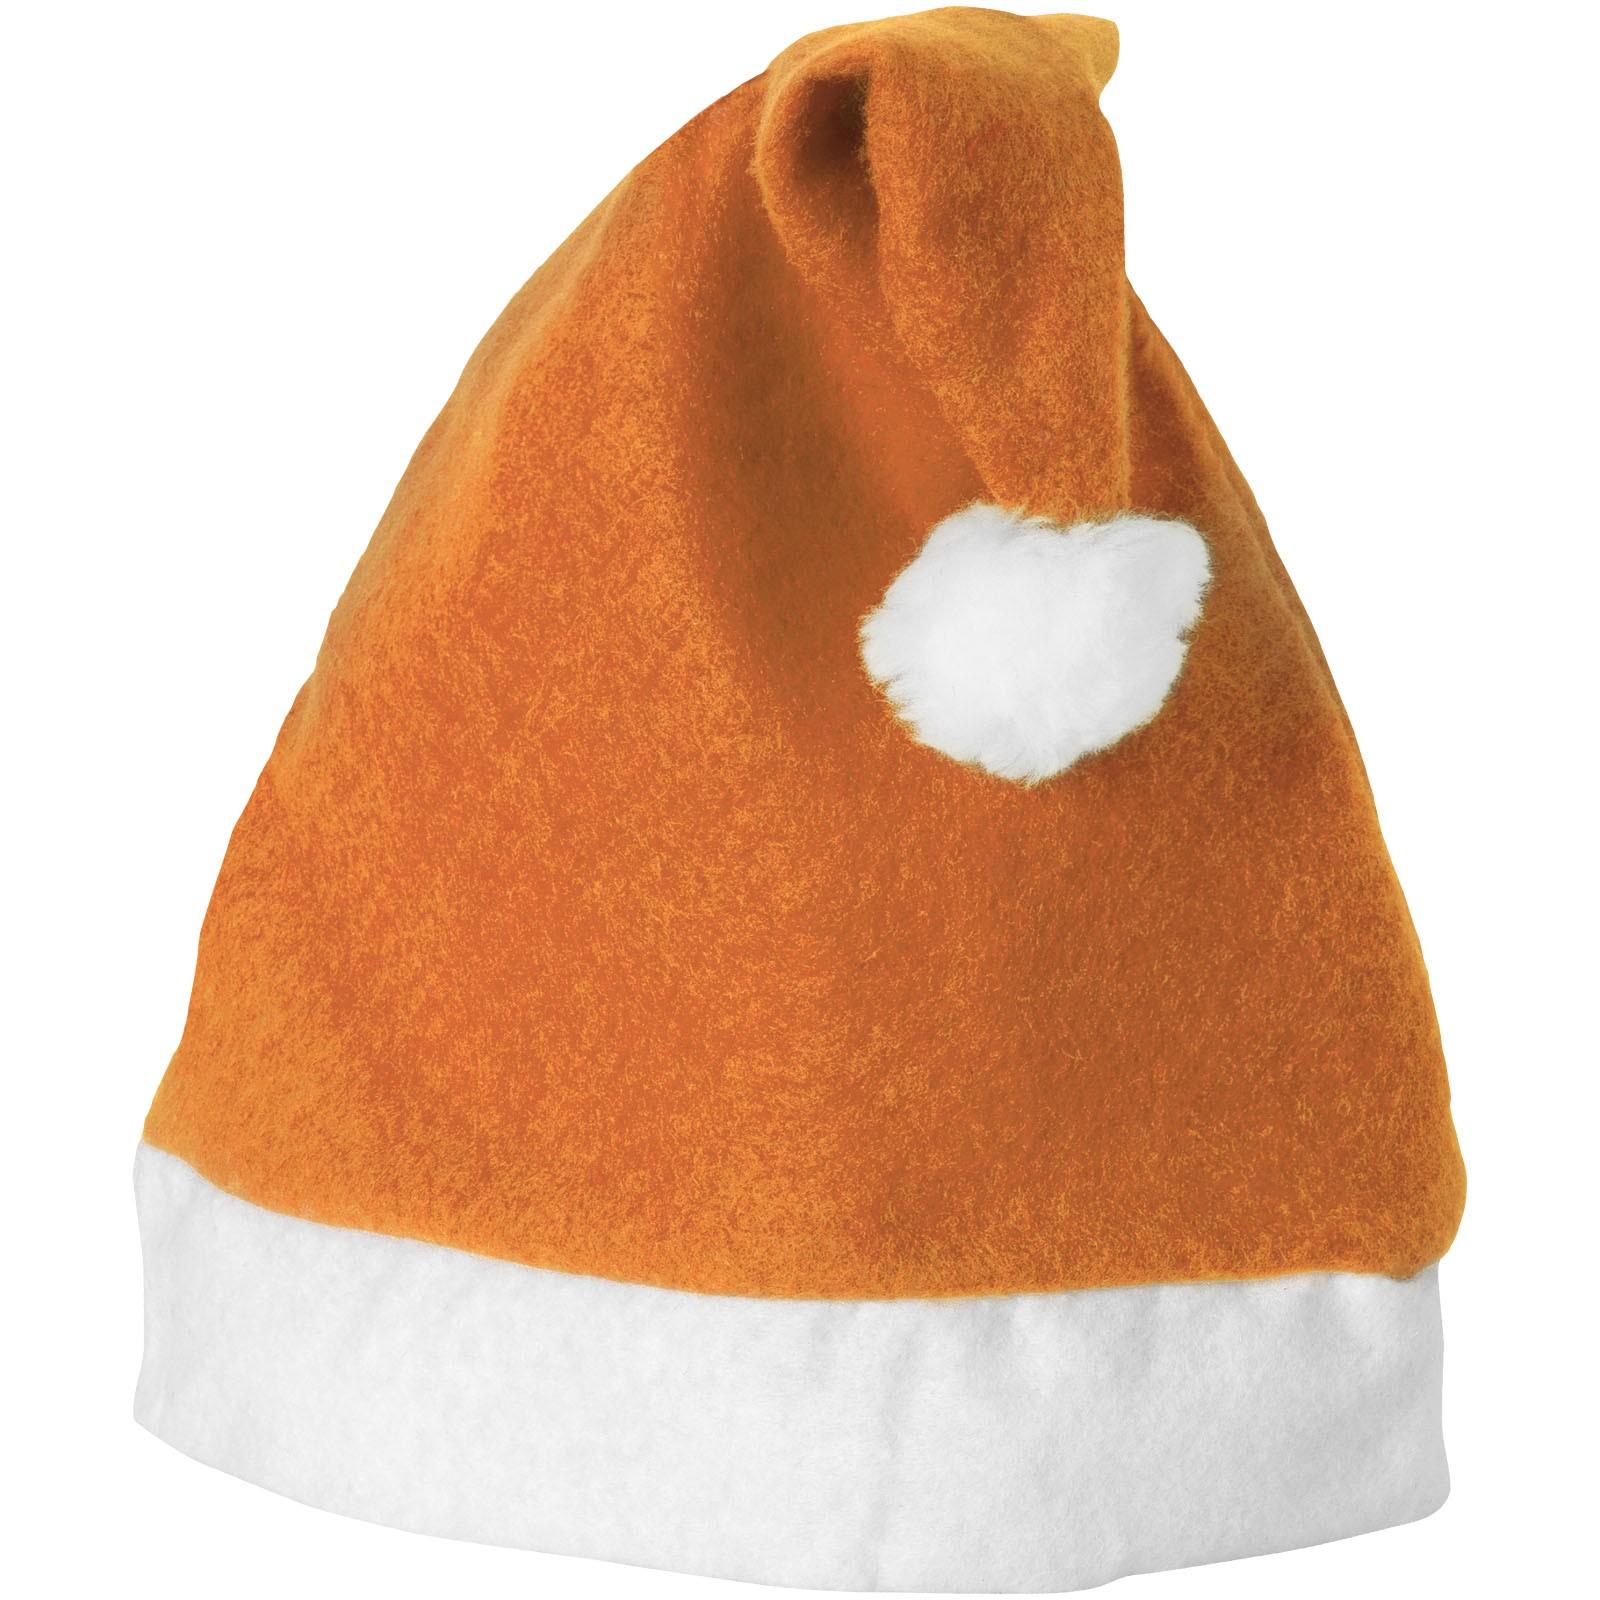 Christmas čepec - 0ranžová / Bílá